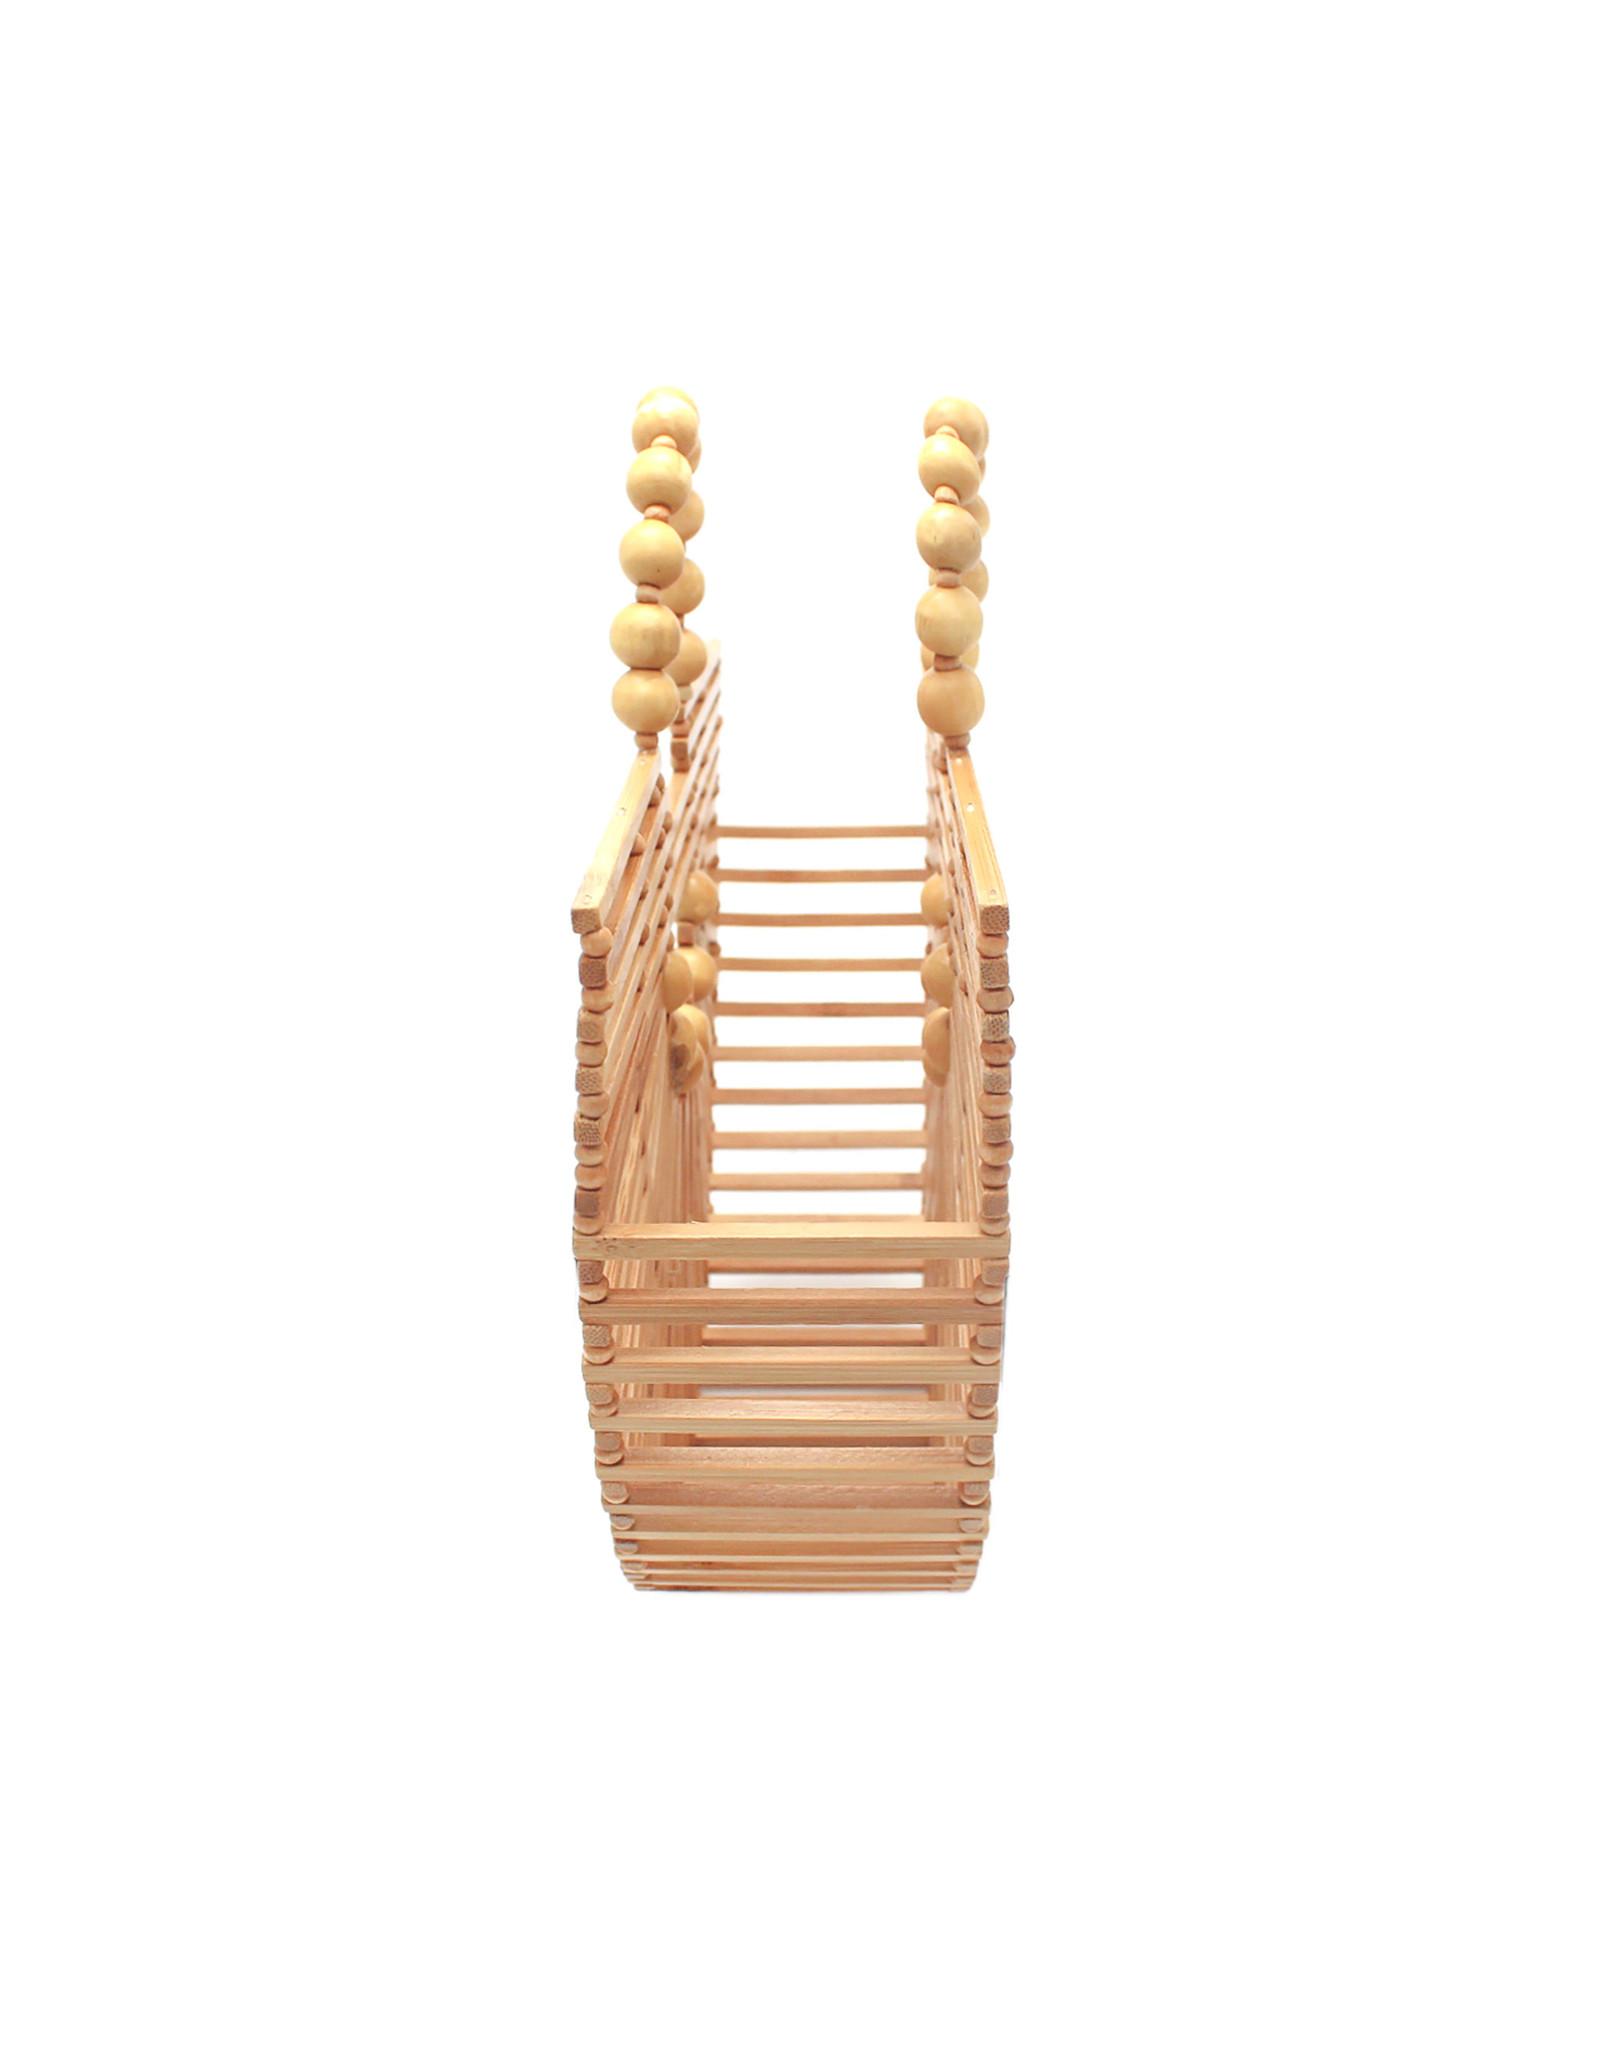 Malibu Bamboo Bag